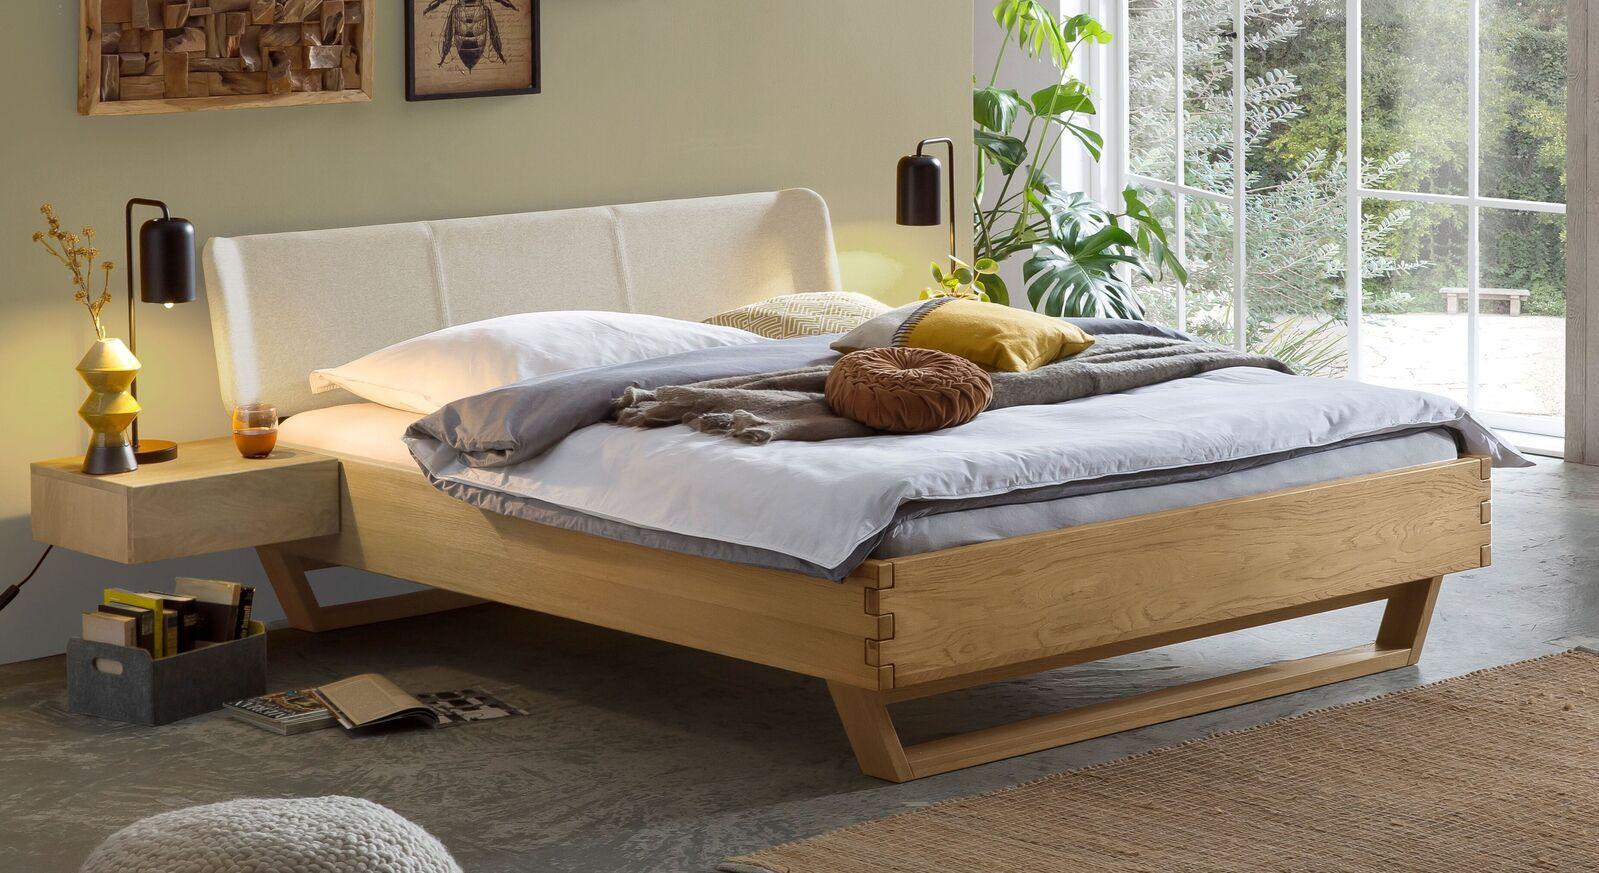 Bett Ubaldo aus Massivholz mit Polster-Kopfteil